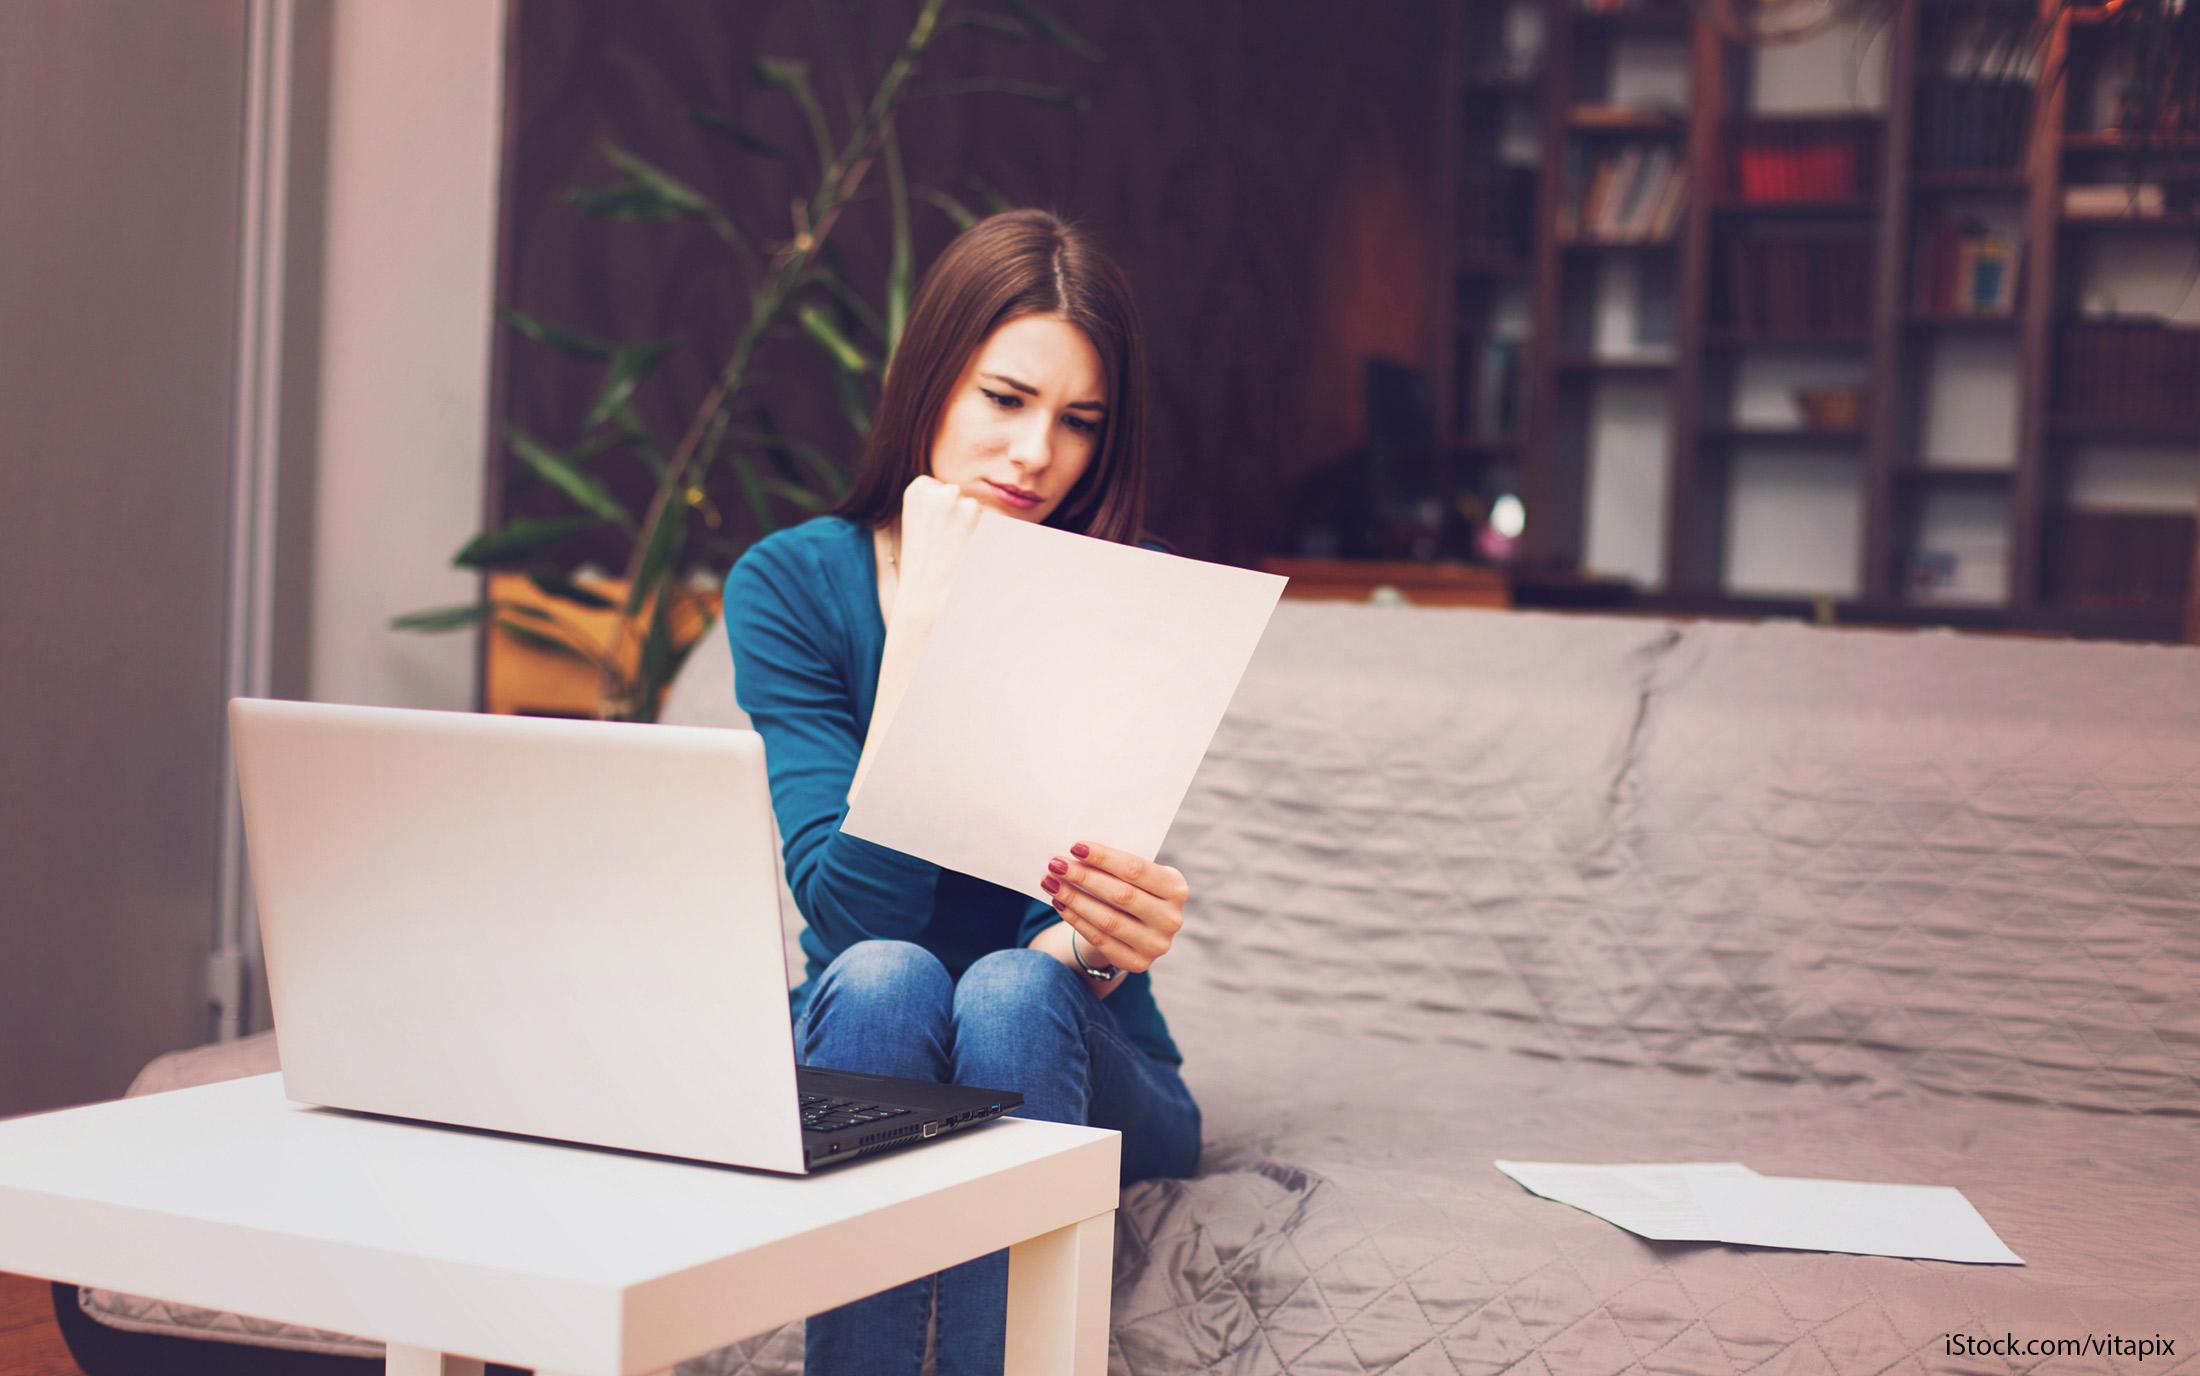 failing pay tax liability